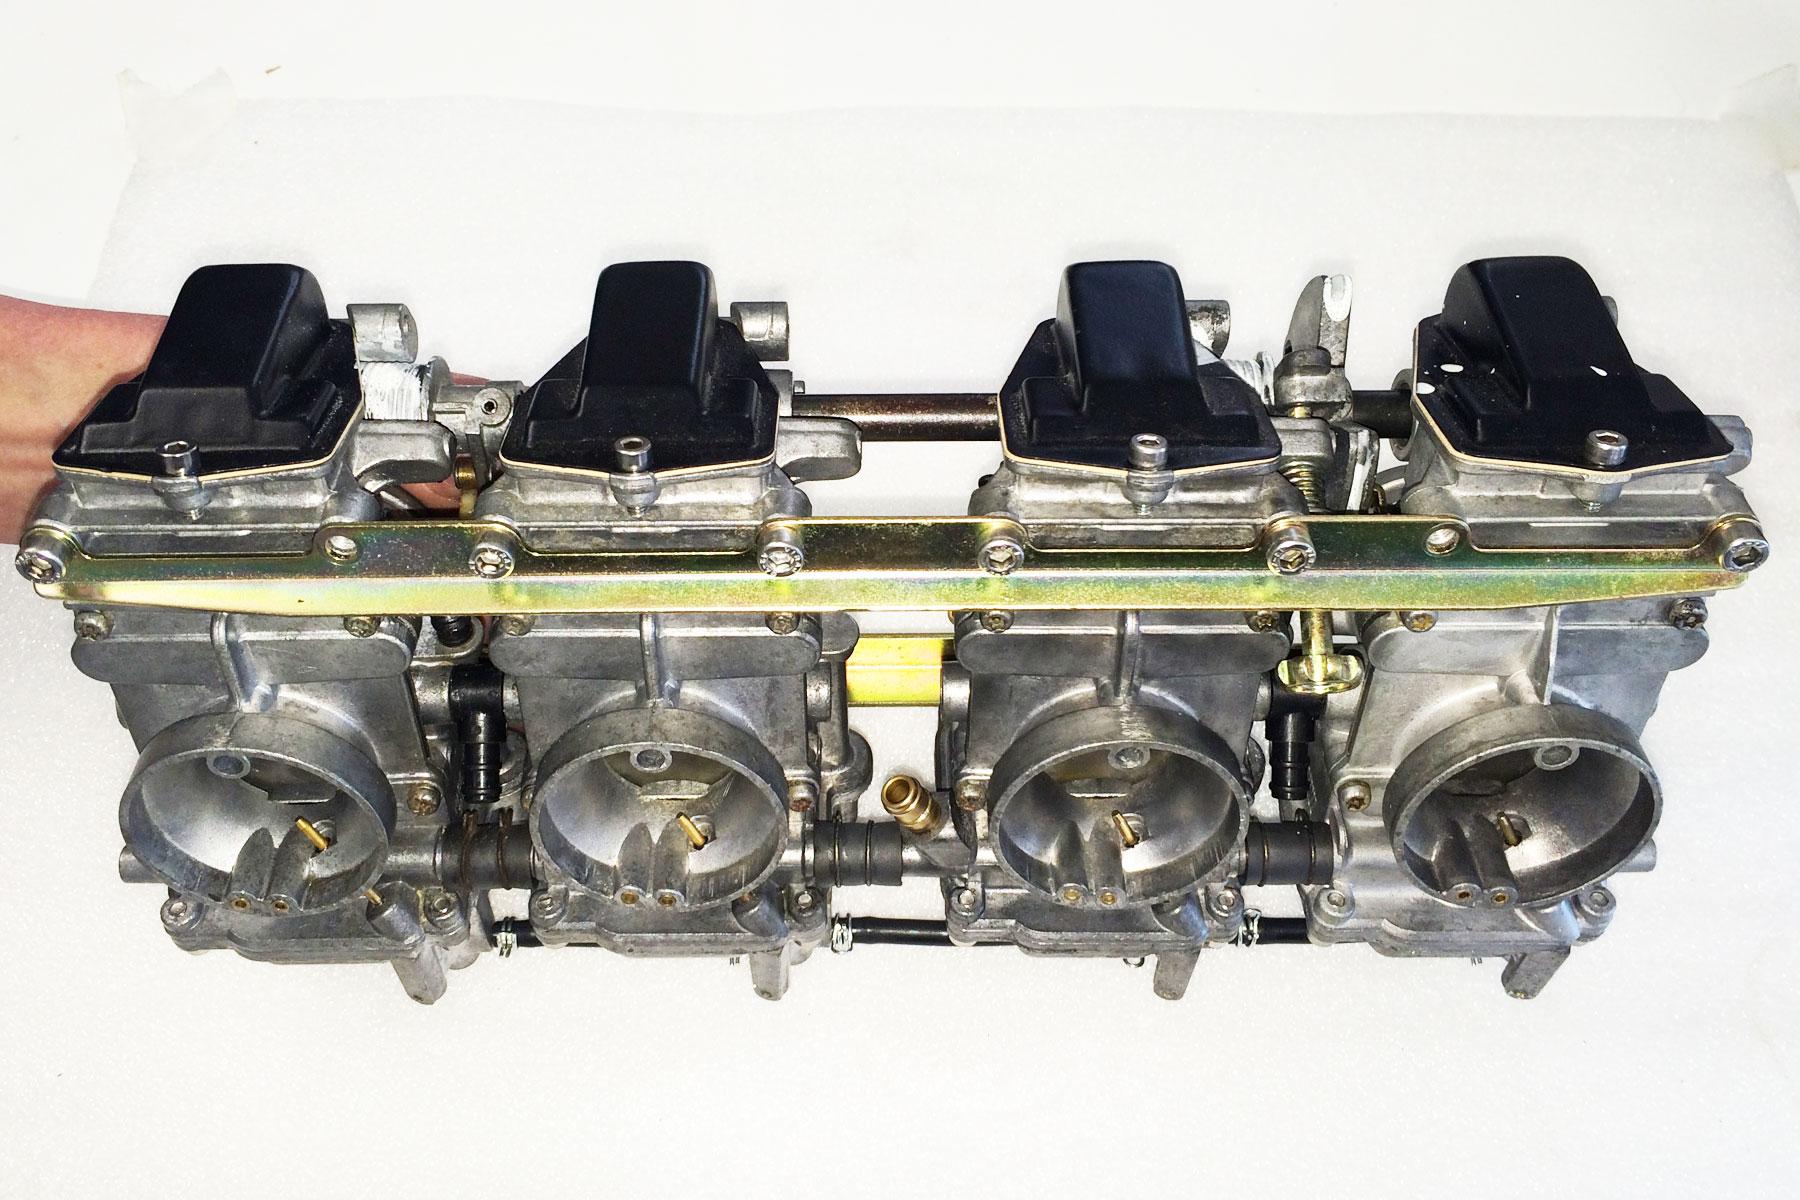 Zed Parts Ltd The Kawasaki Z1300 Specialist Zn1300 Wiring Harness Pic 021